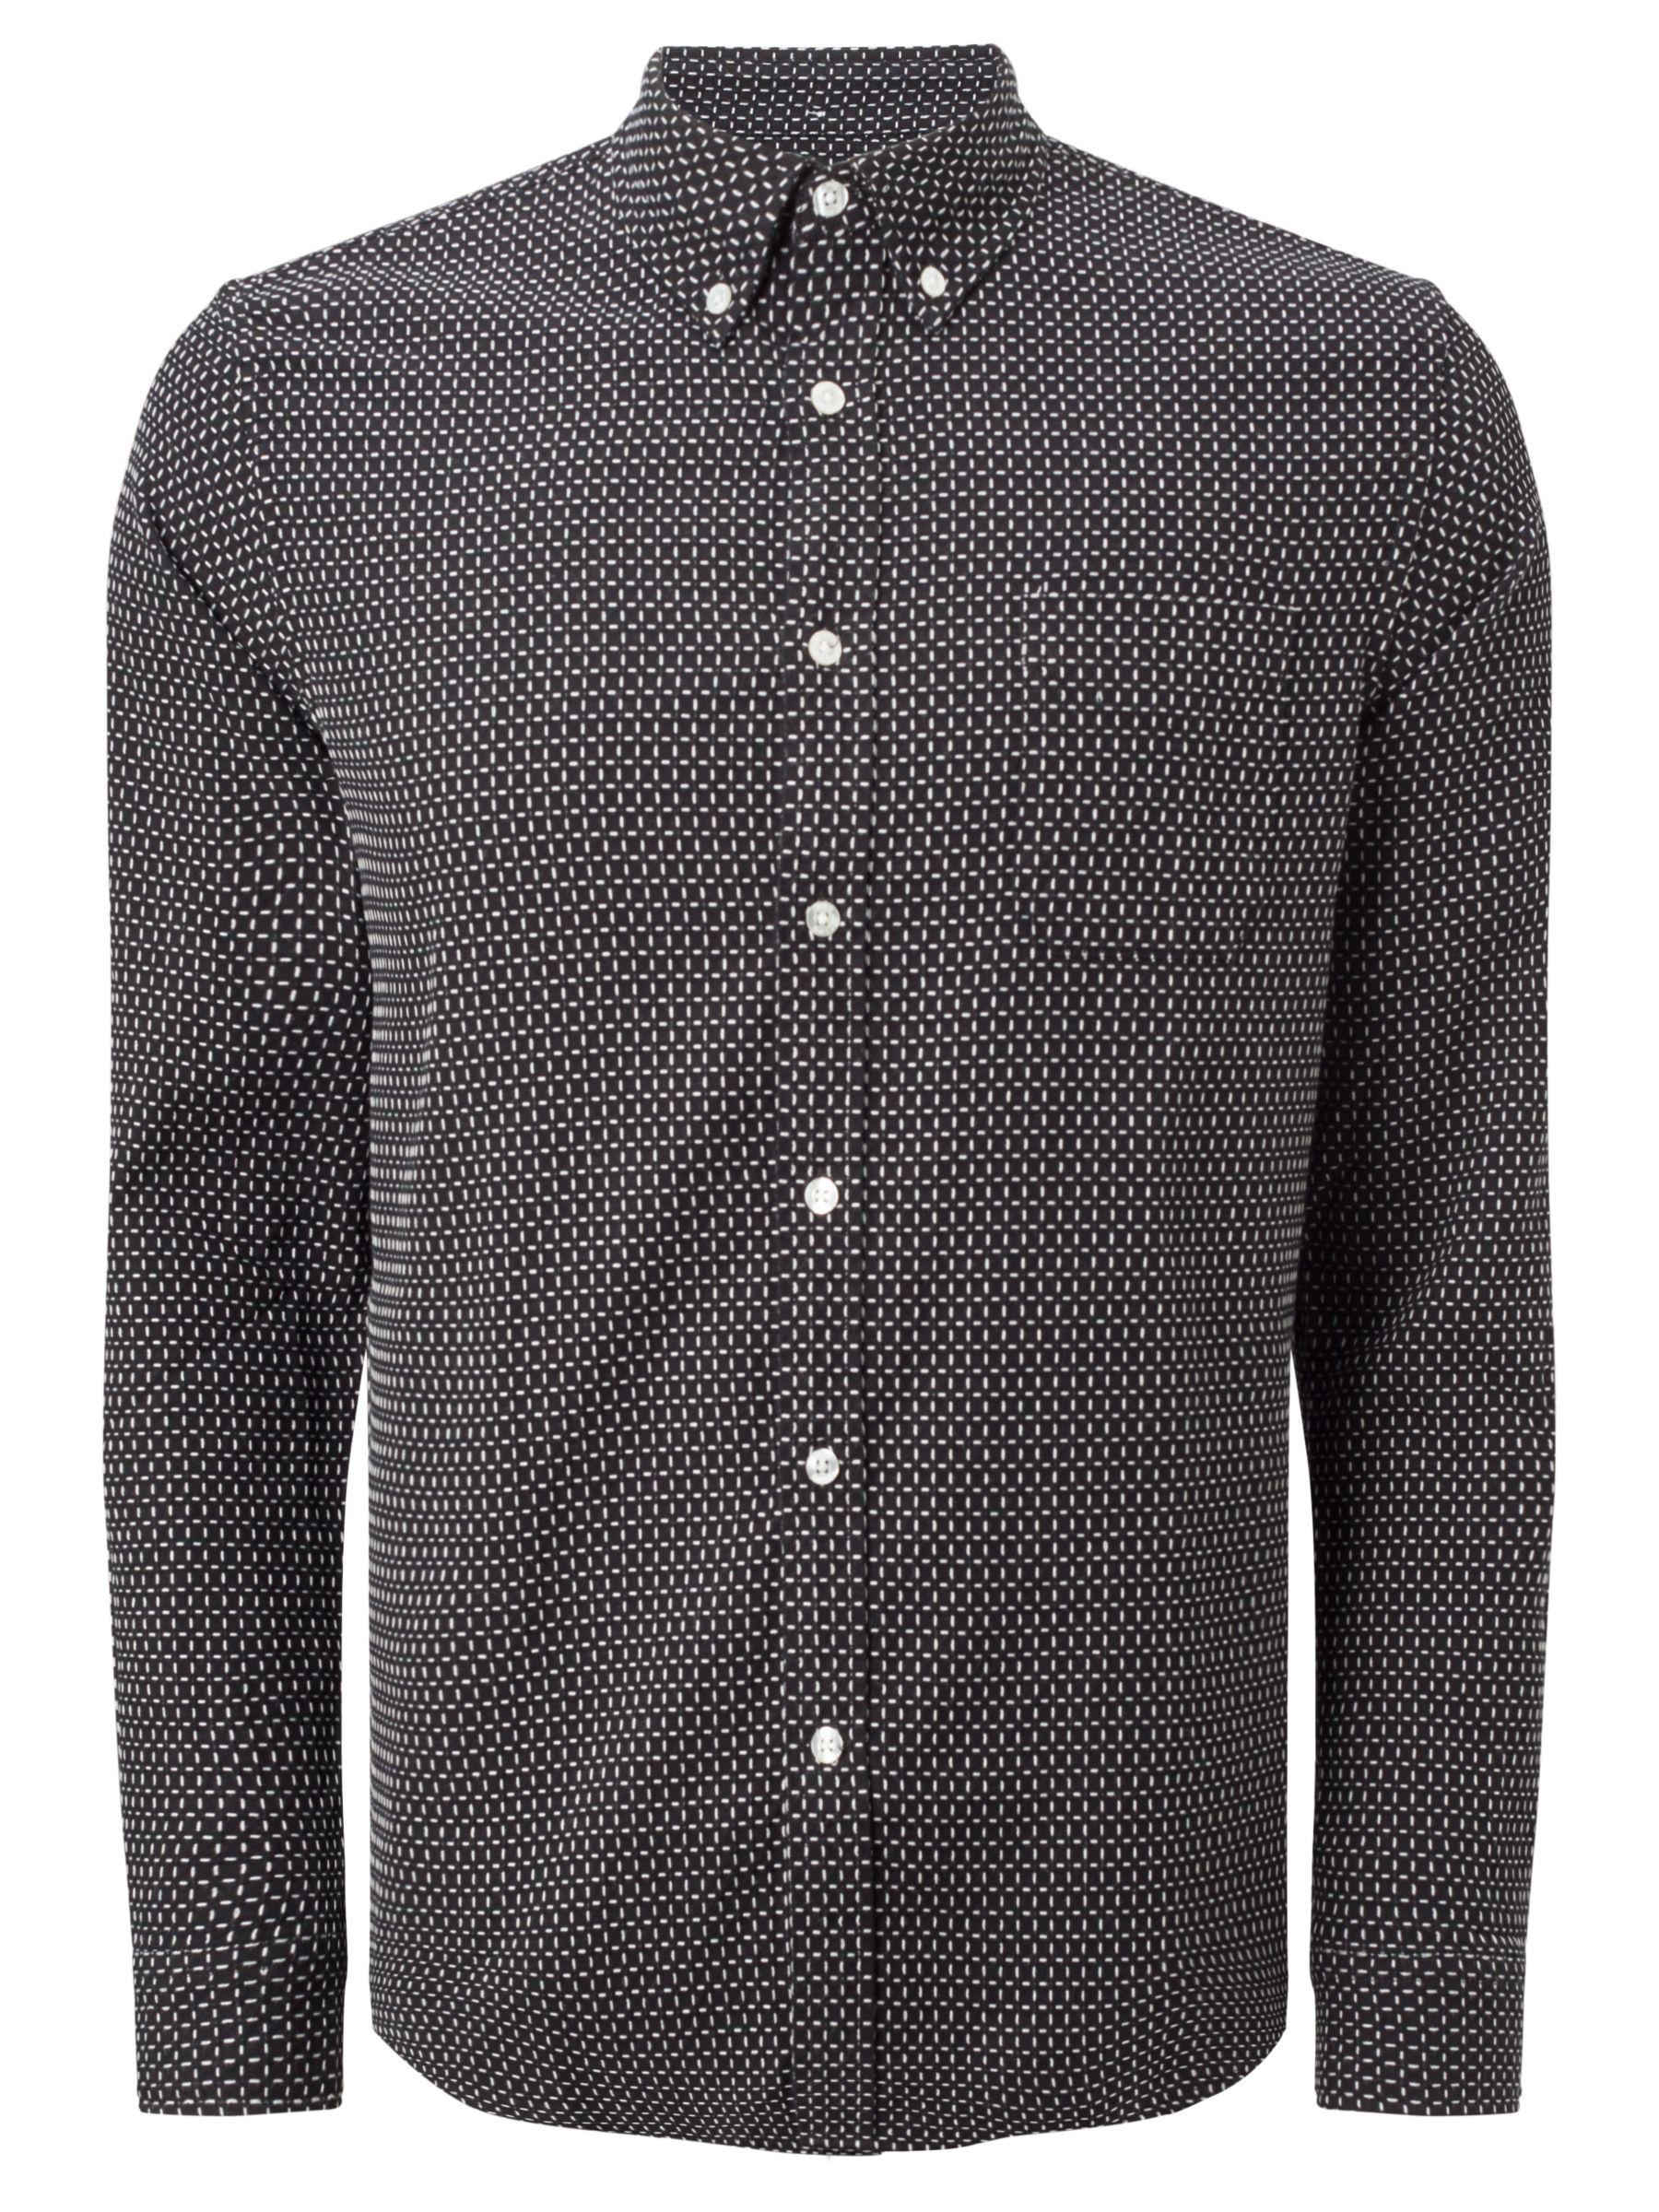 Edwin Edwin Essential Shirt, Black/White